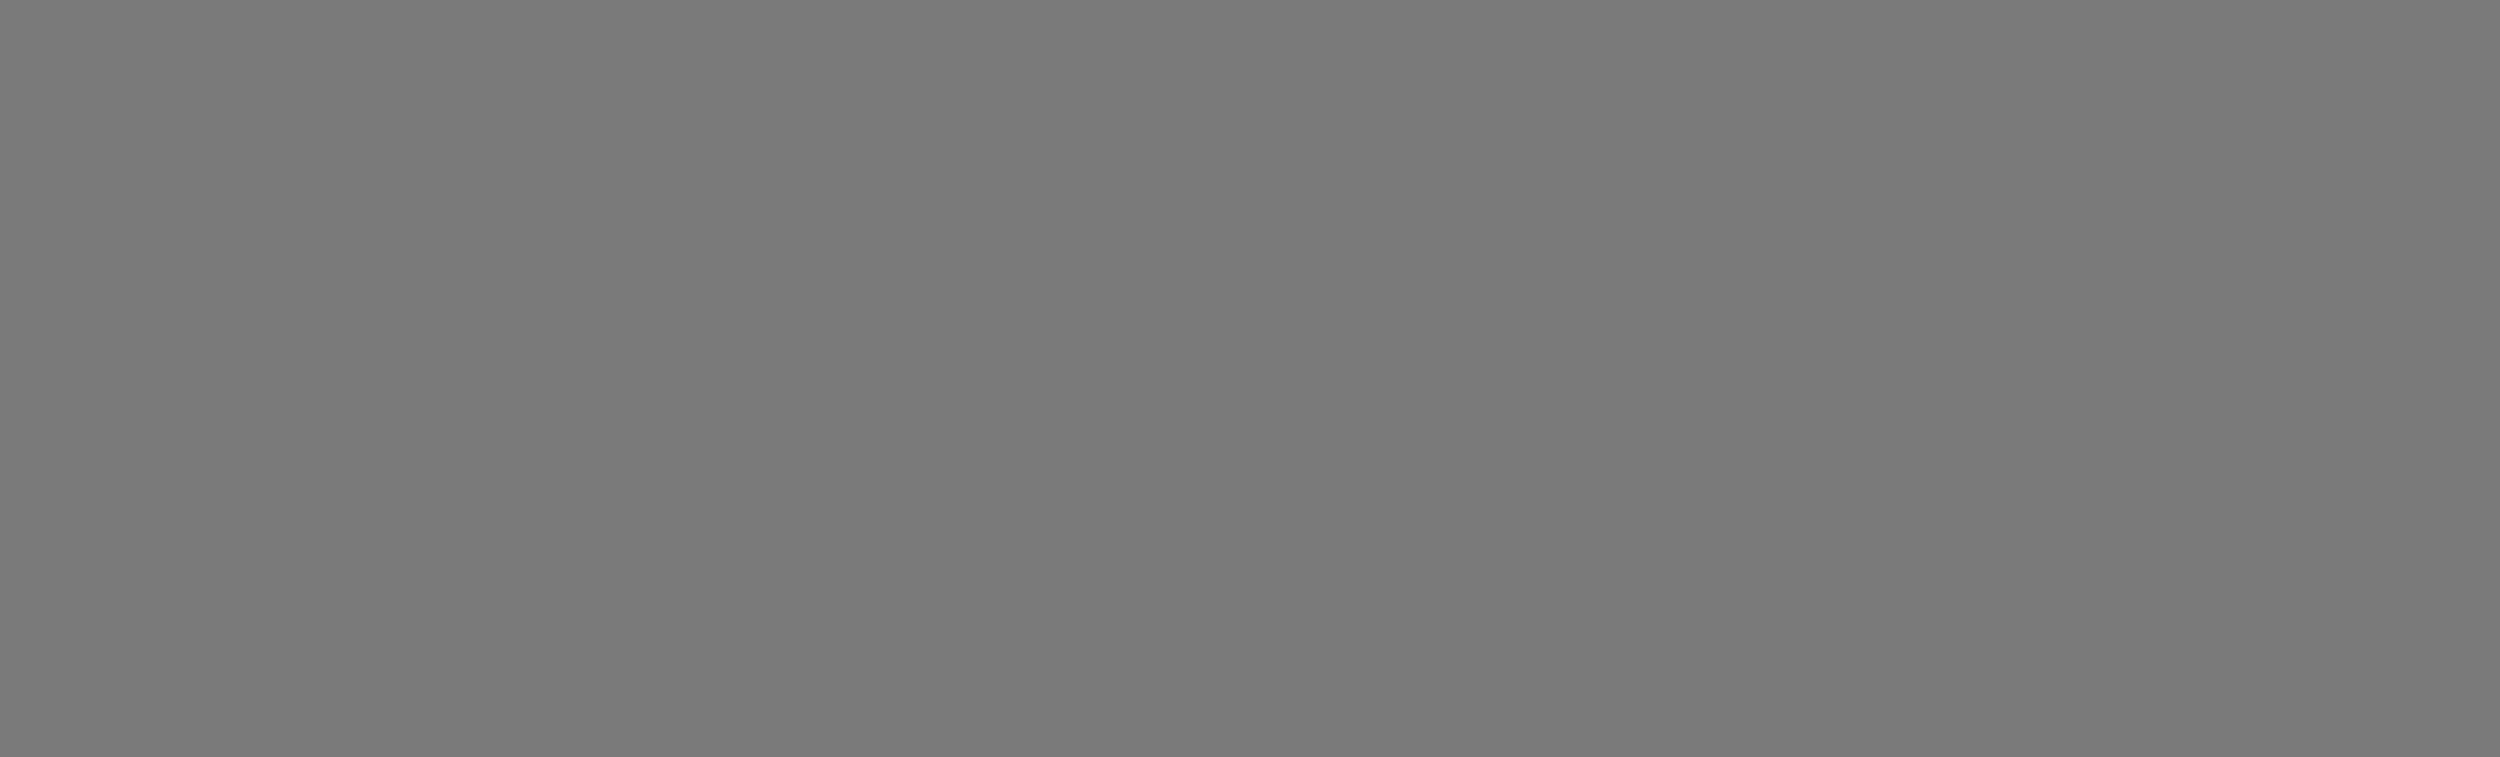 BBOT-Logo-Wall-w2500.png